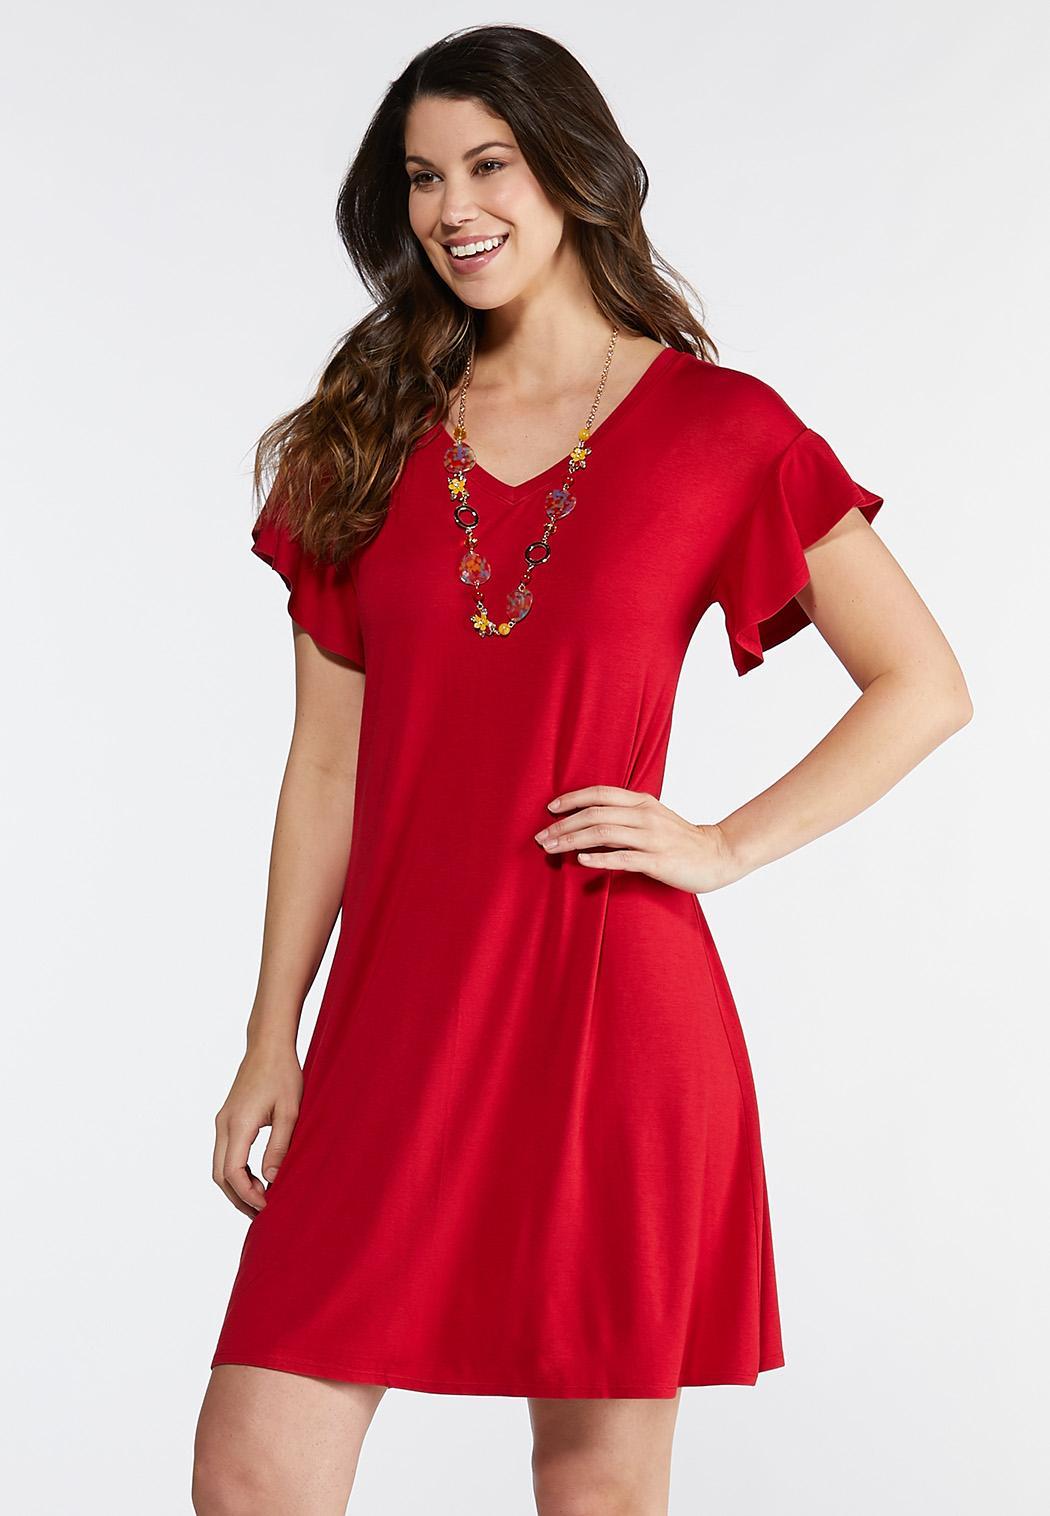 Plus Size Red T-Shirt Dress